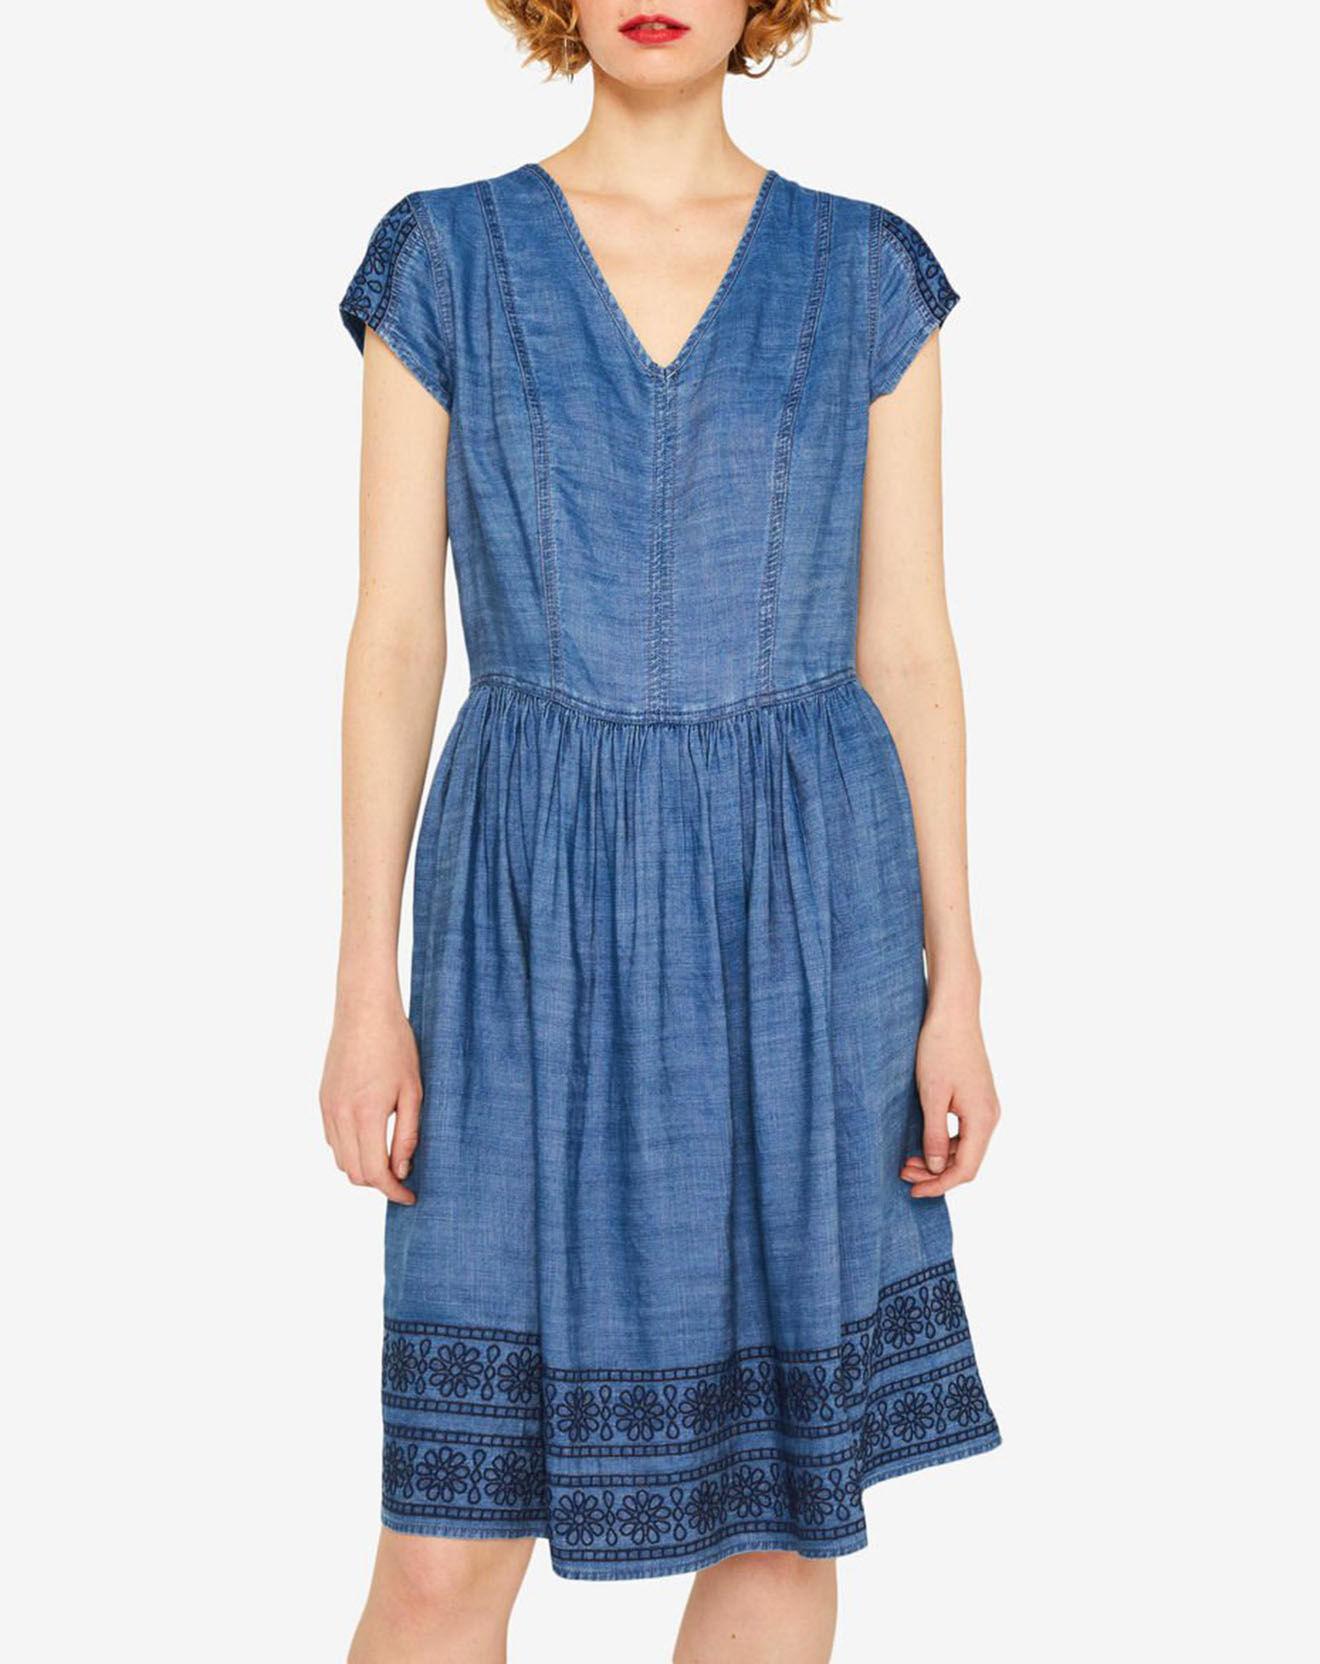 Robe en jean Broderies bleue - Esprit - Modalova